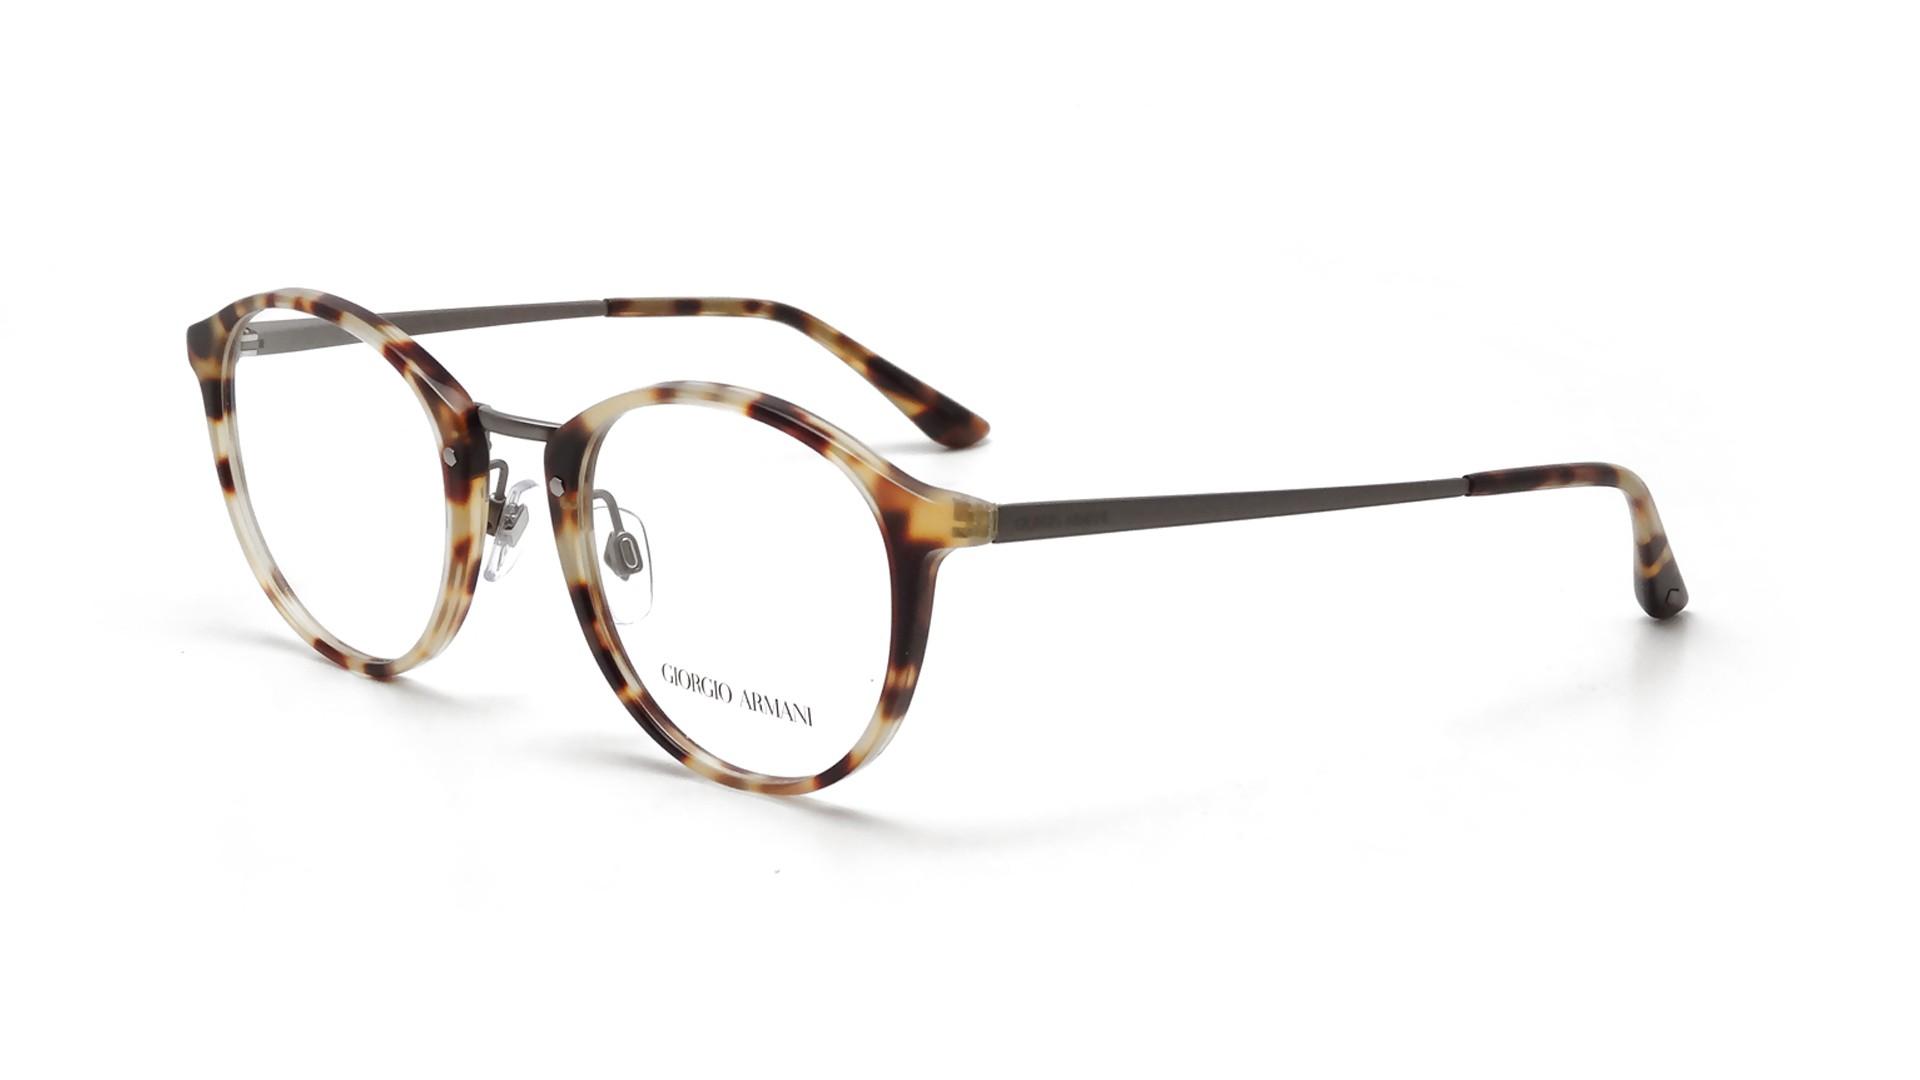 Giorgio Armani Frames Of Life Eyeglasses Heritage Malta